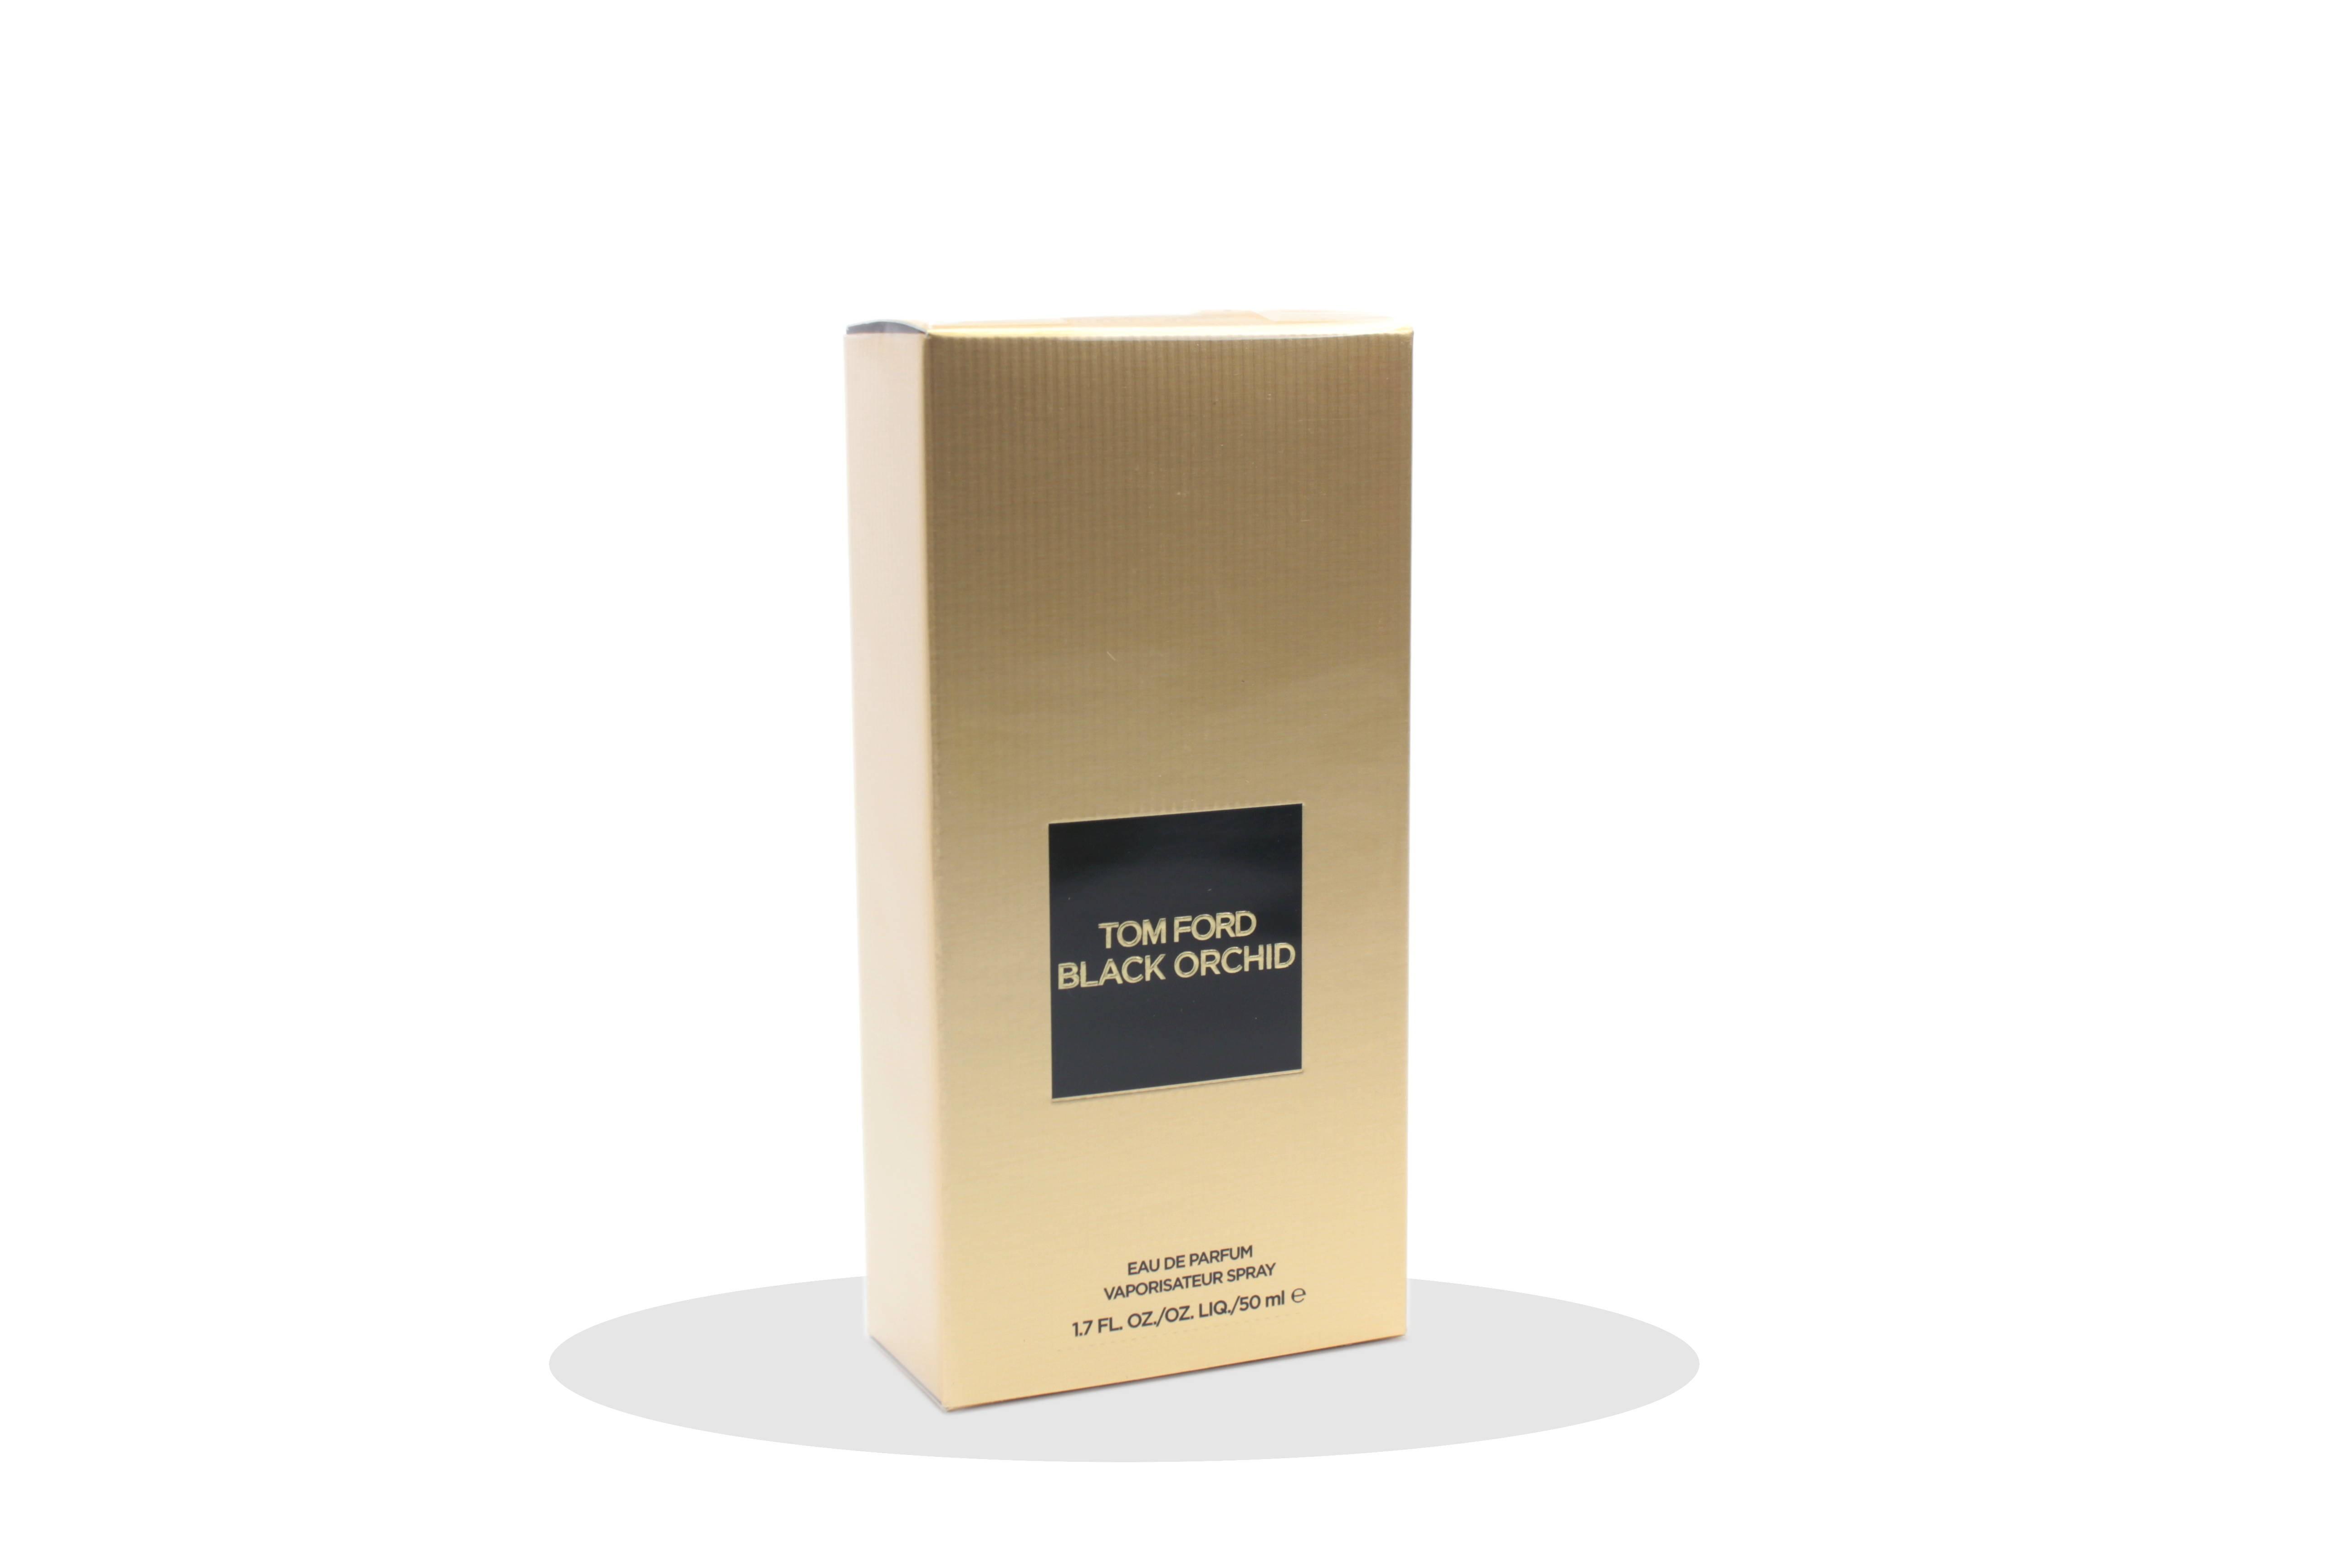 Tom Ford Black Orchid Perfume Woman Edp 50ml Vapo Perfume Woman